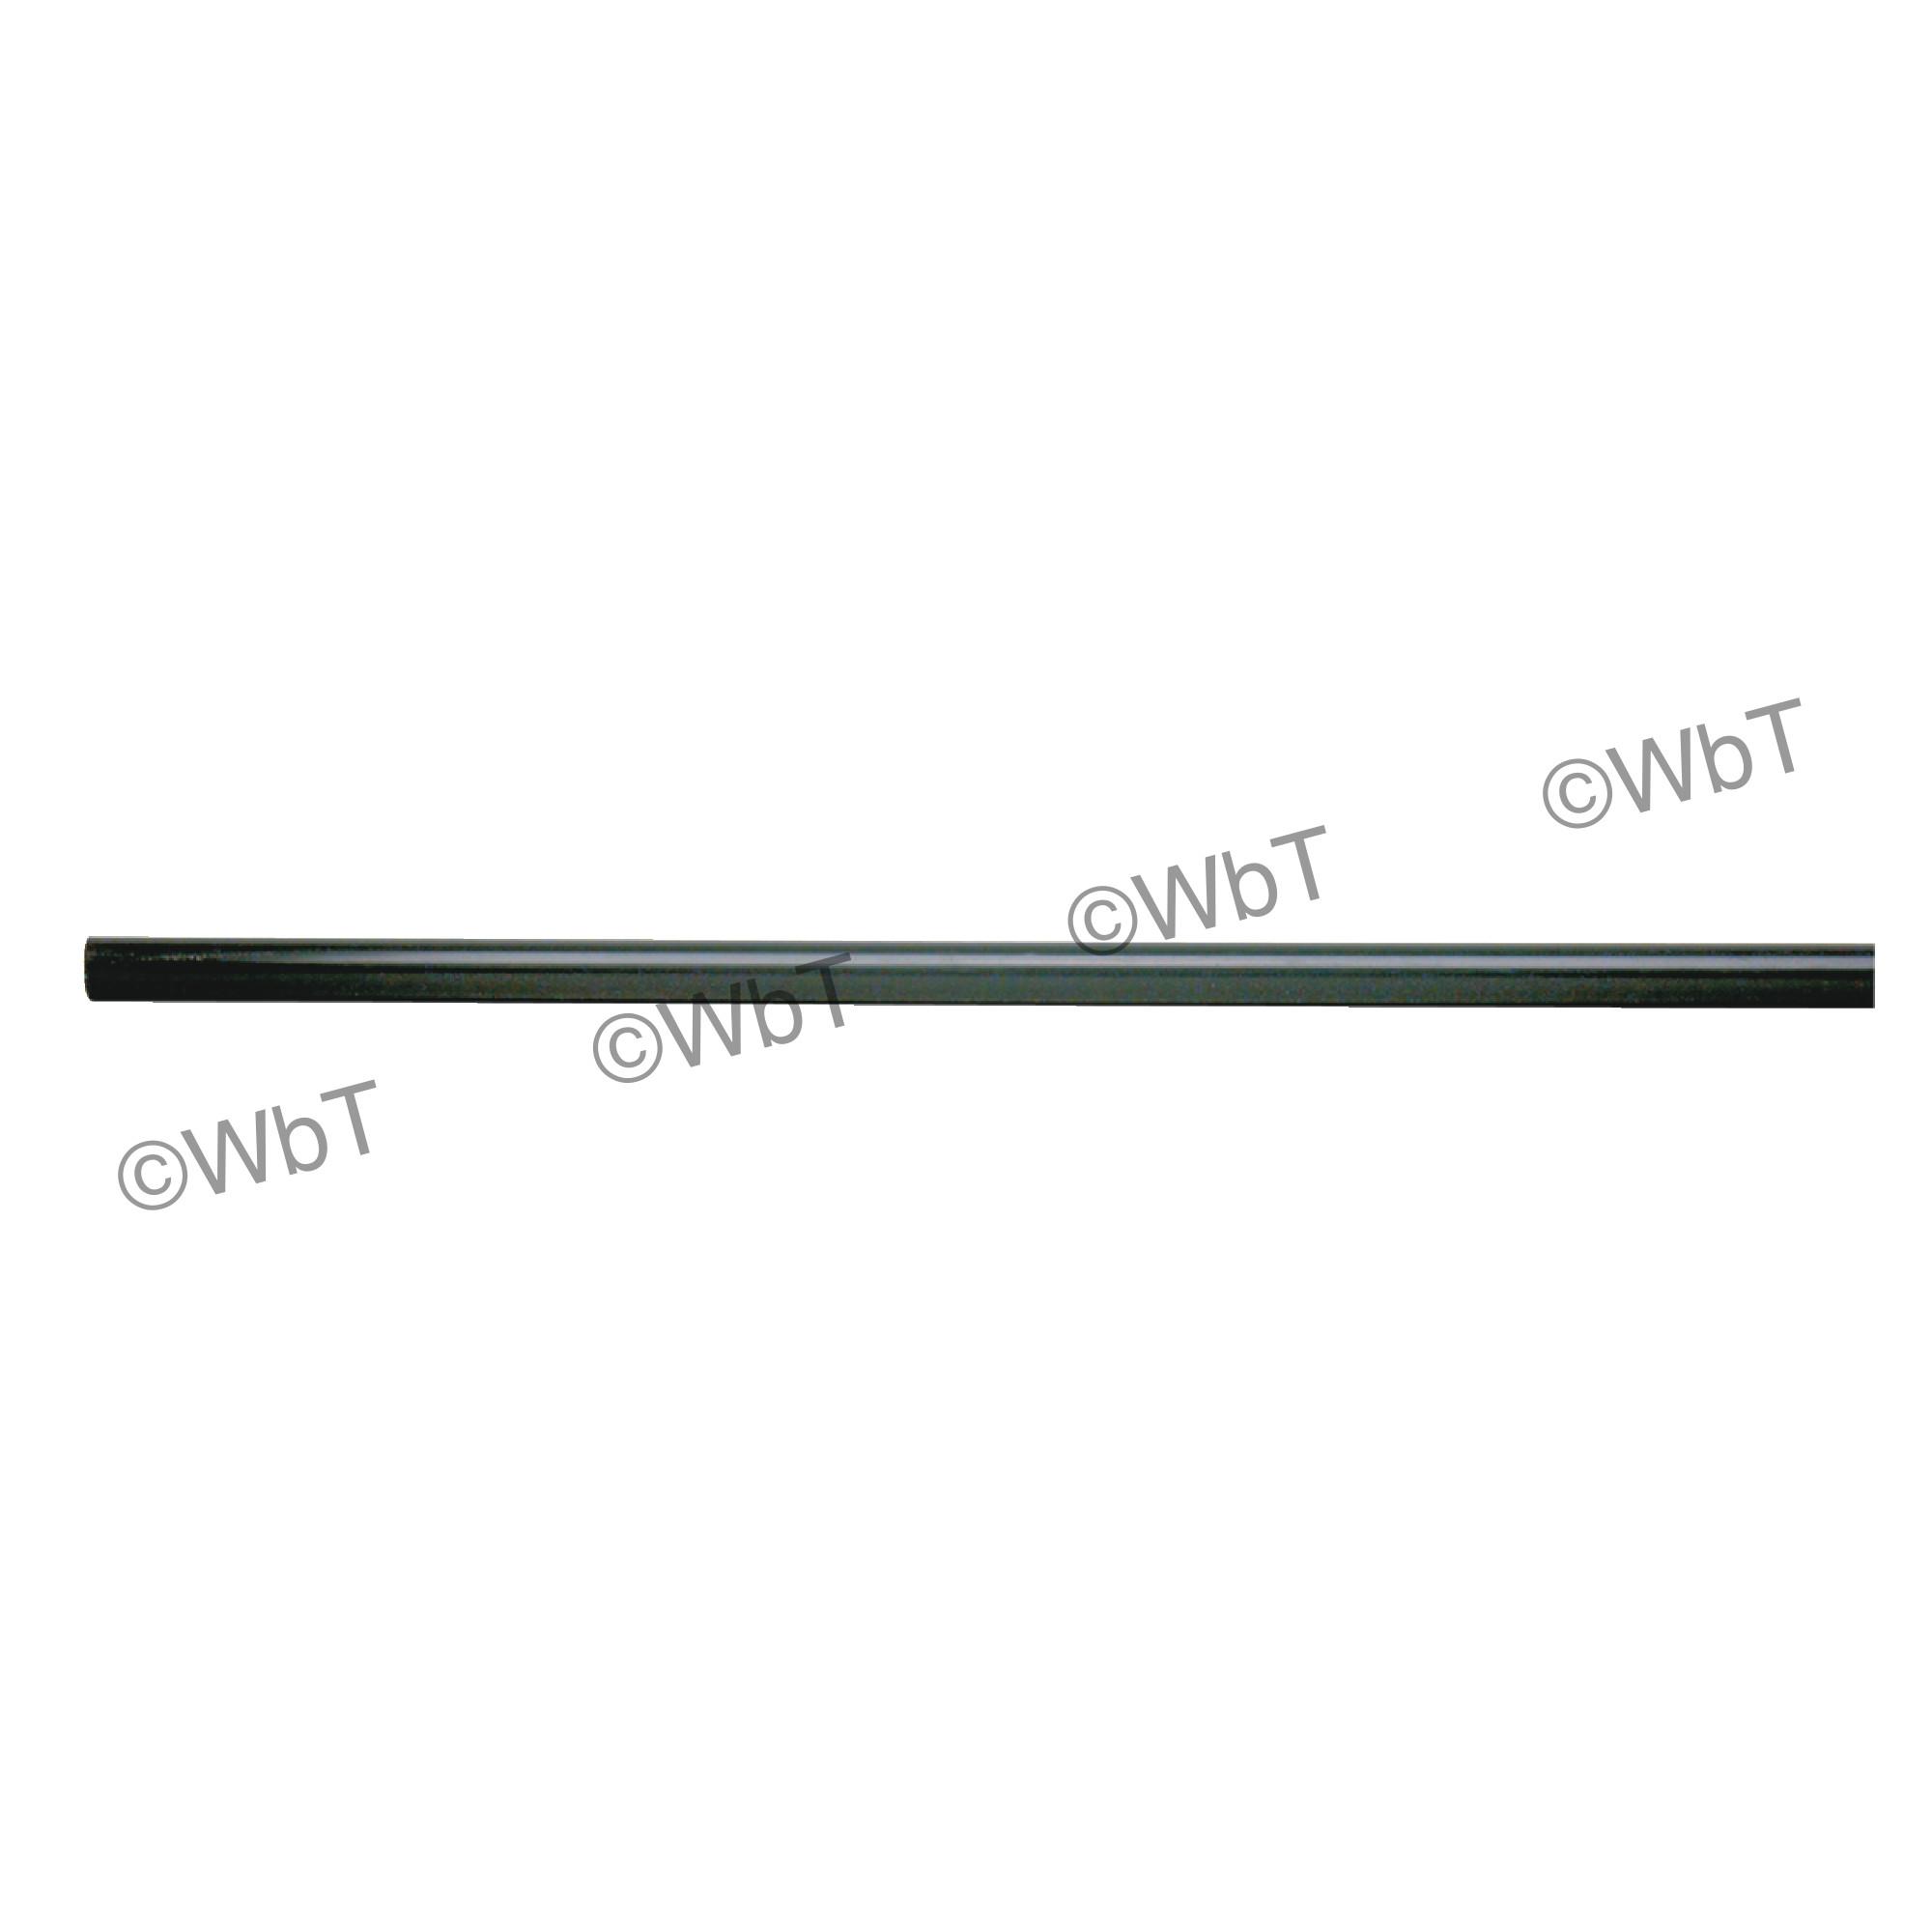 PVC (Polyvinylchloride) Type I Rod